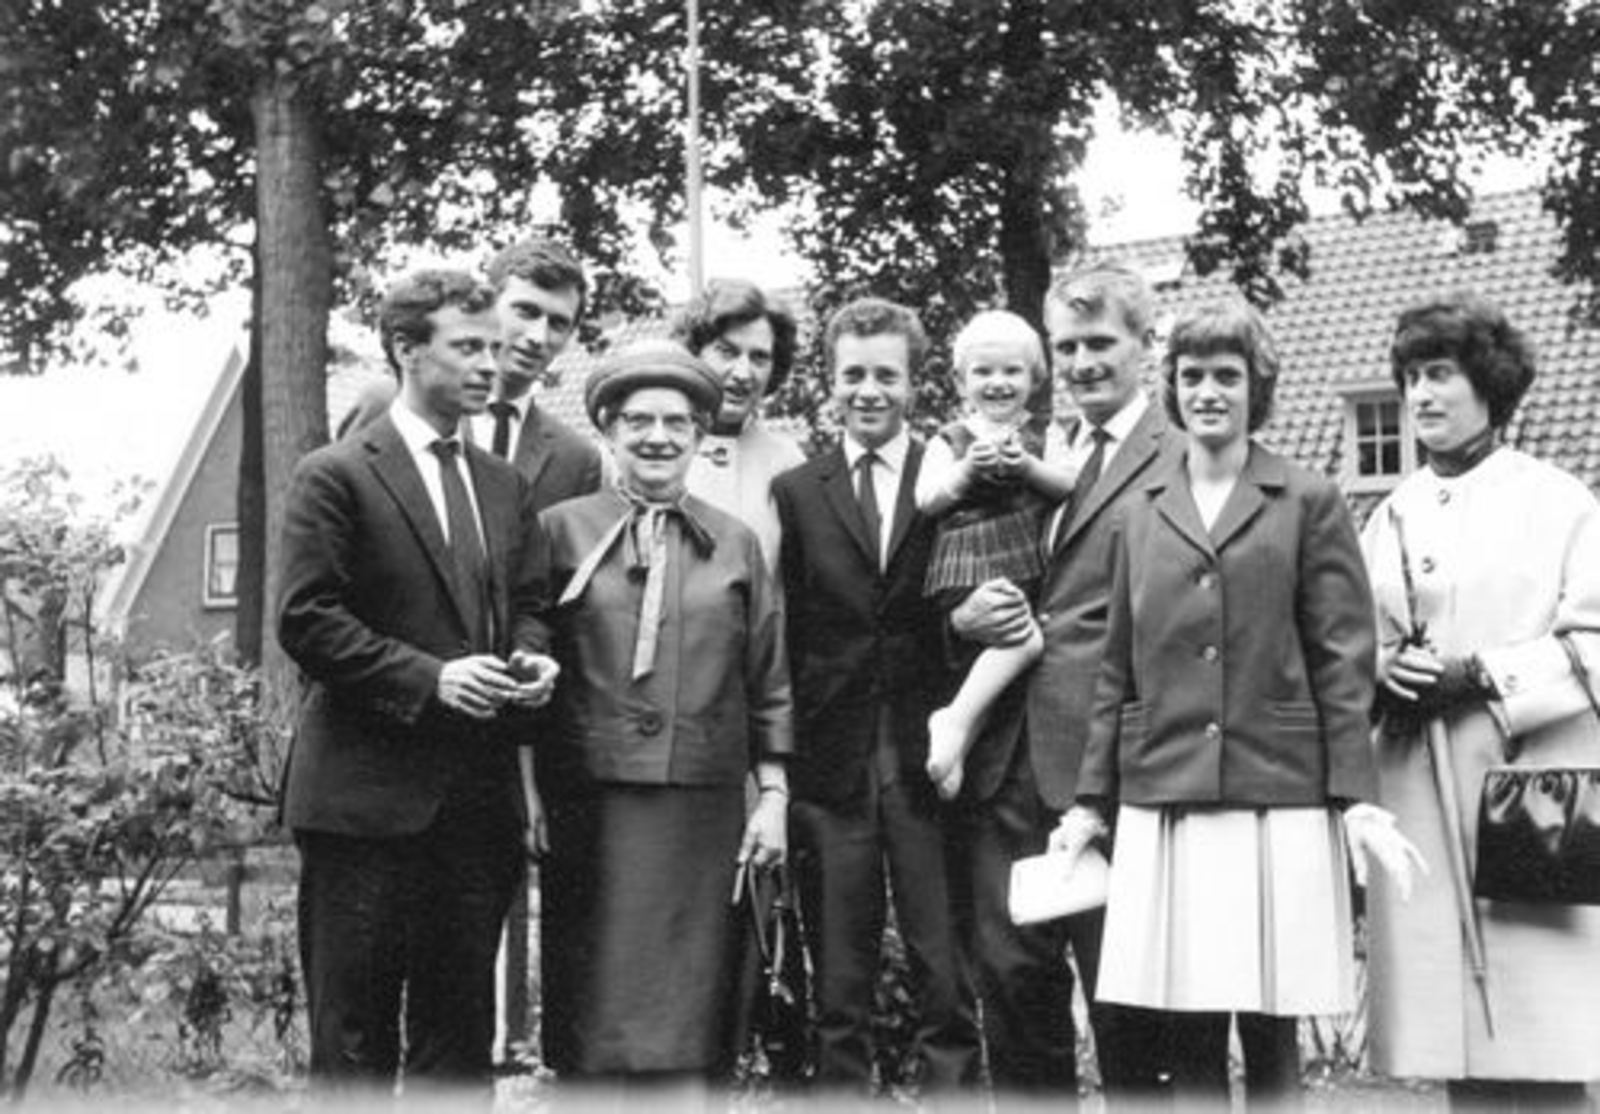 Dam-Stroomer Geertje 1901 1964± met Familie in tuin Stationsweg